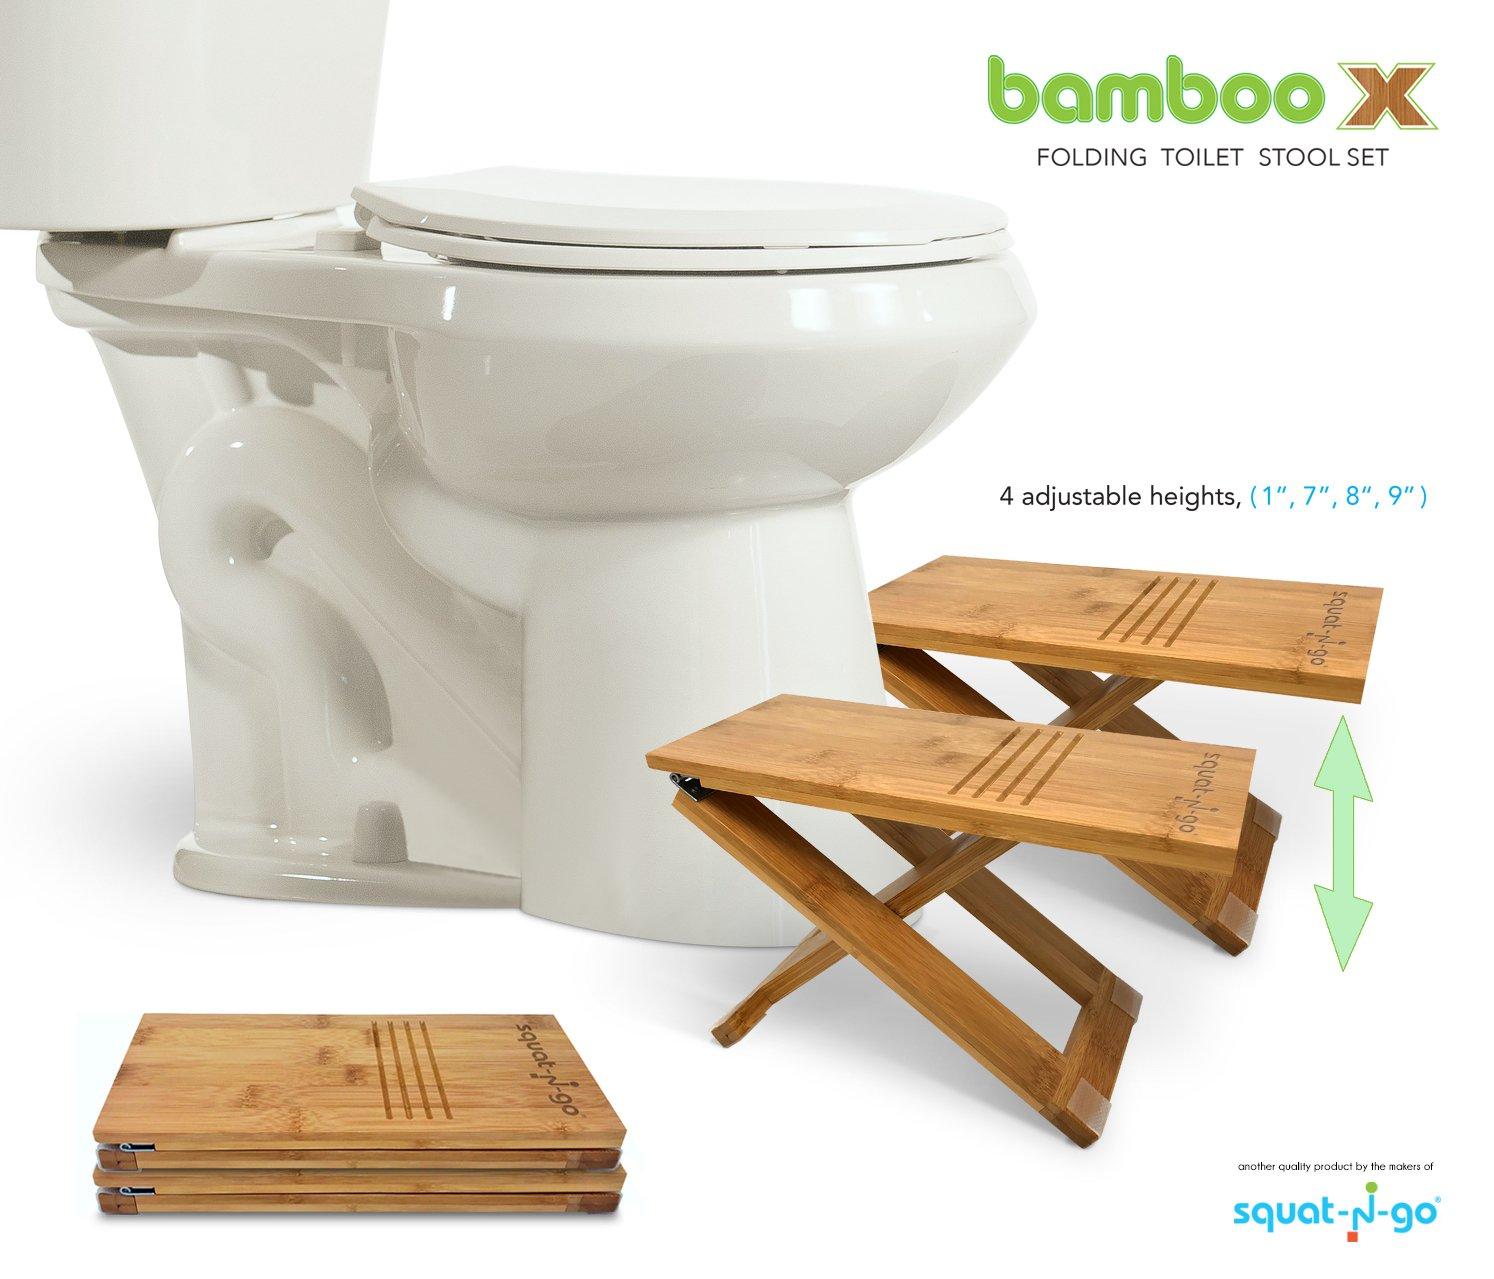 Squat N Go Bamboo X Toilet Stool | Fully Adjustable, Ultra Portable & Eco Friendly | Bonus Travel Bag Included